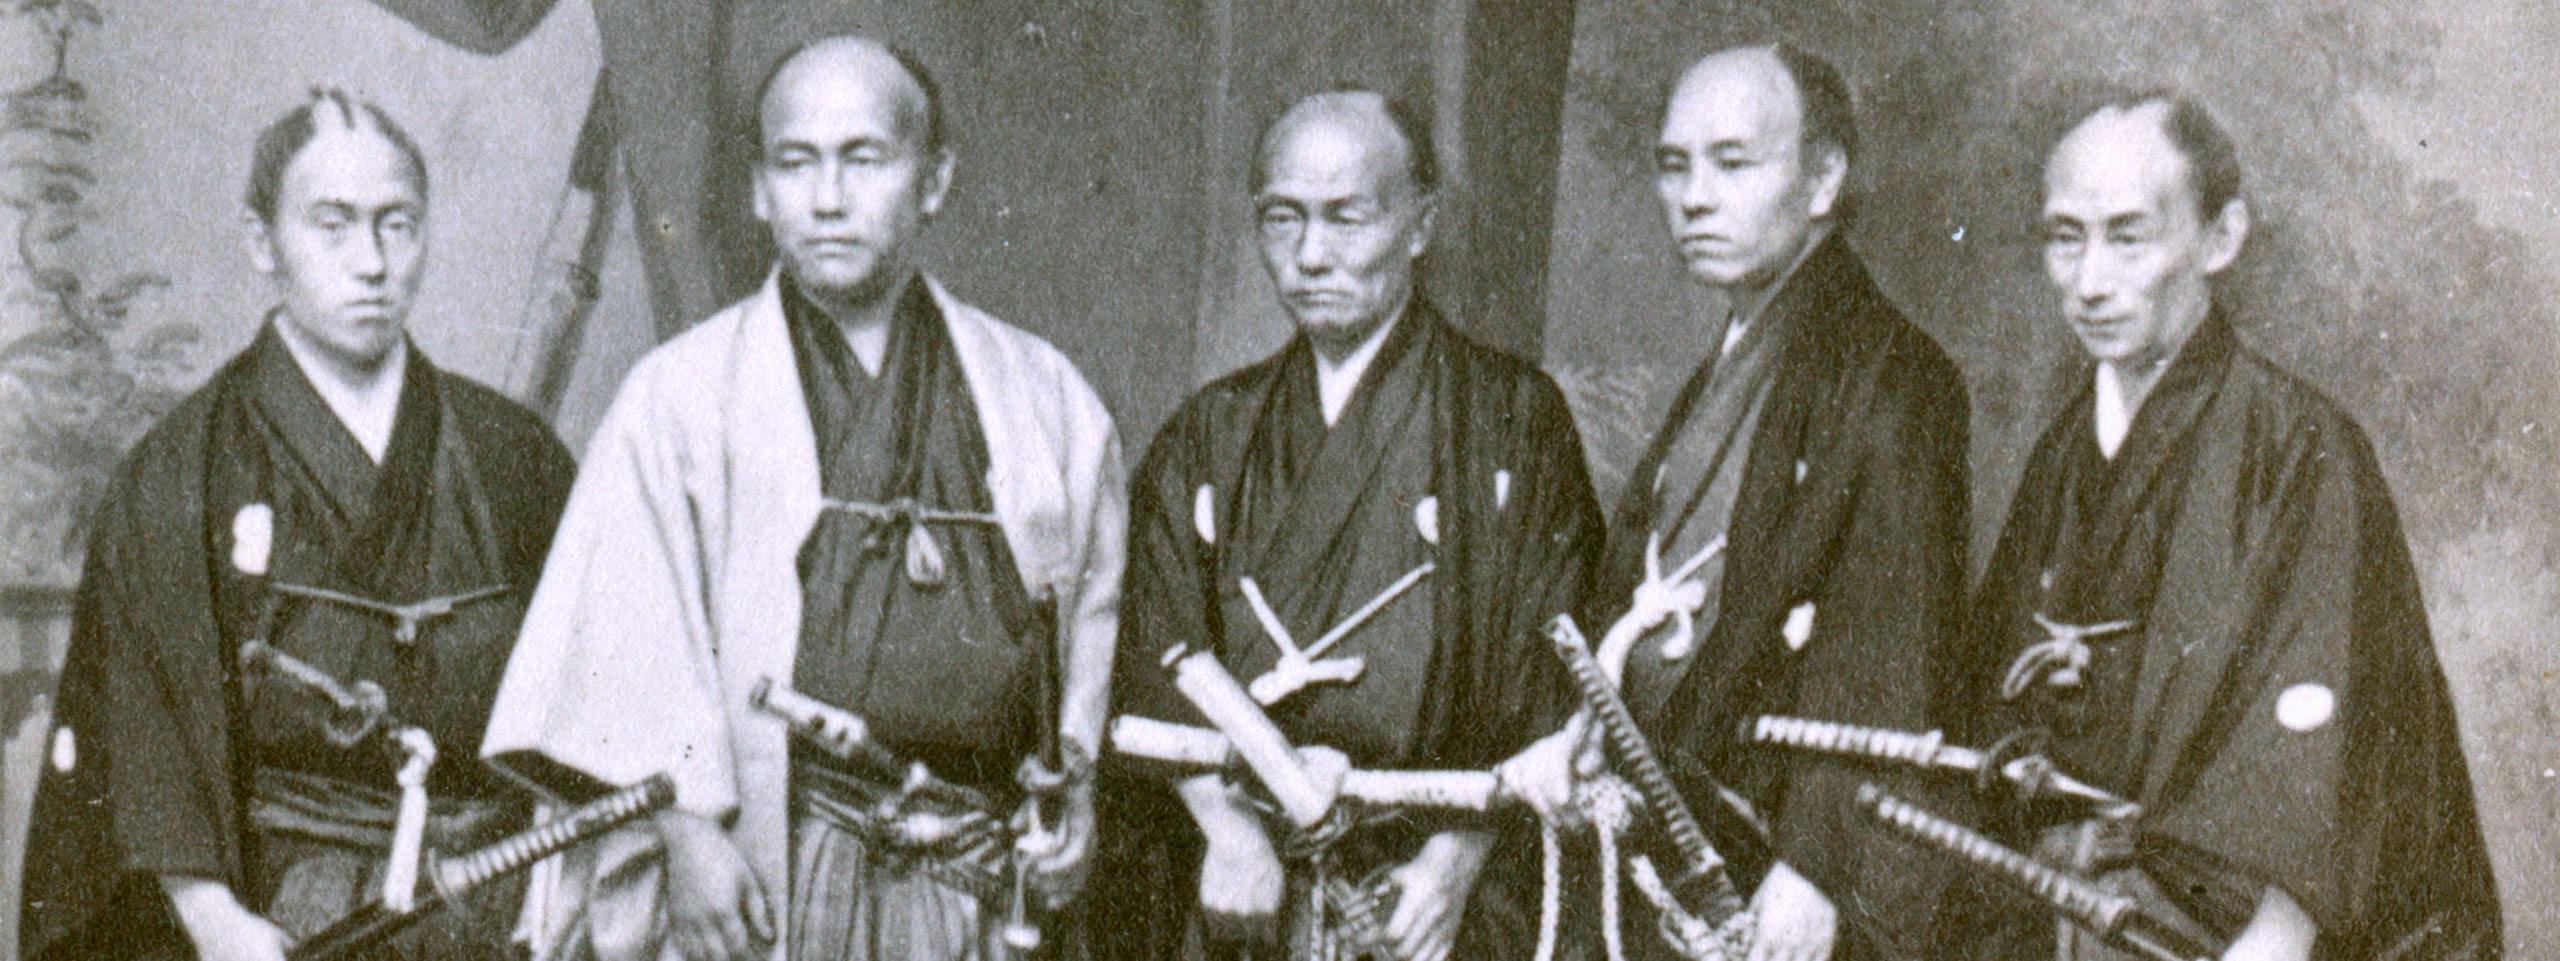 Samurai Delegation 1860 New York